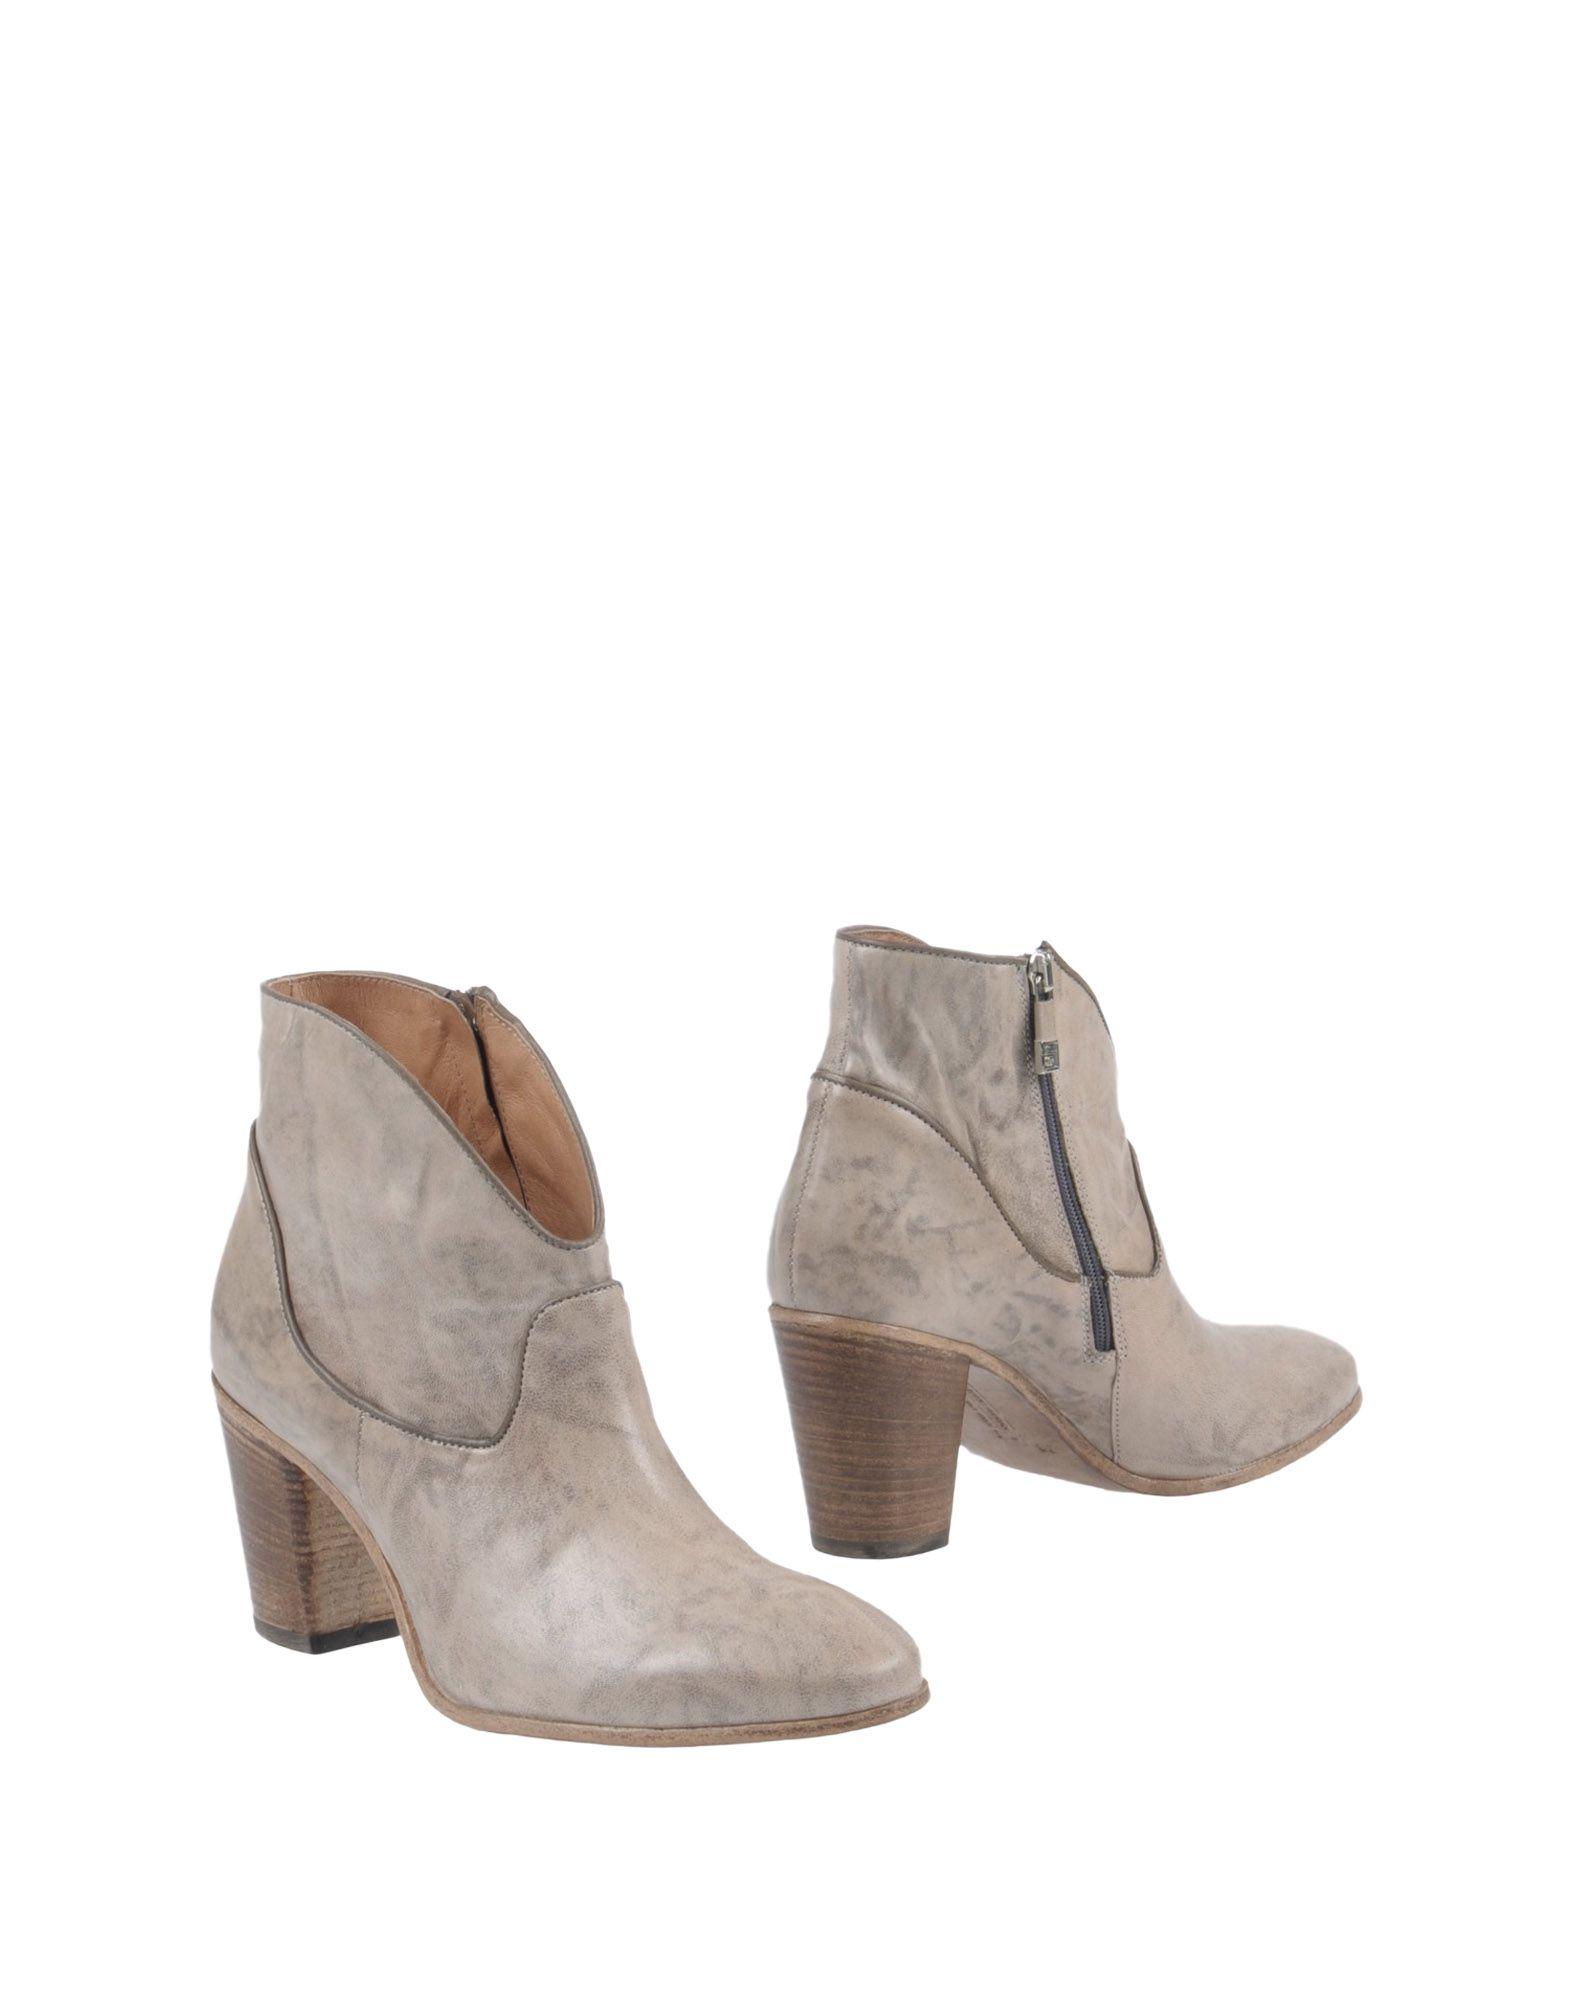 Alberto Fermani 11449087JXGut Stiefelette Damen  11449087JXGut Fermani aussehende strapazierfähige Schuhe 32603c